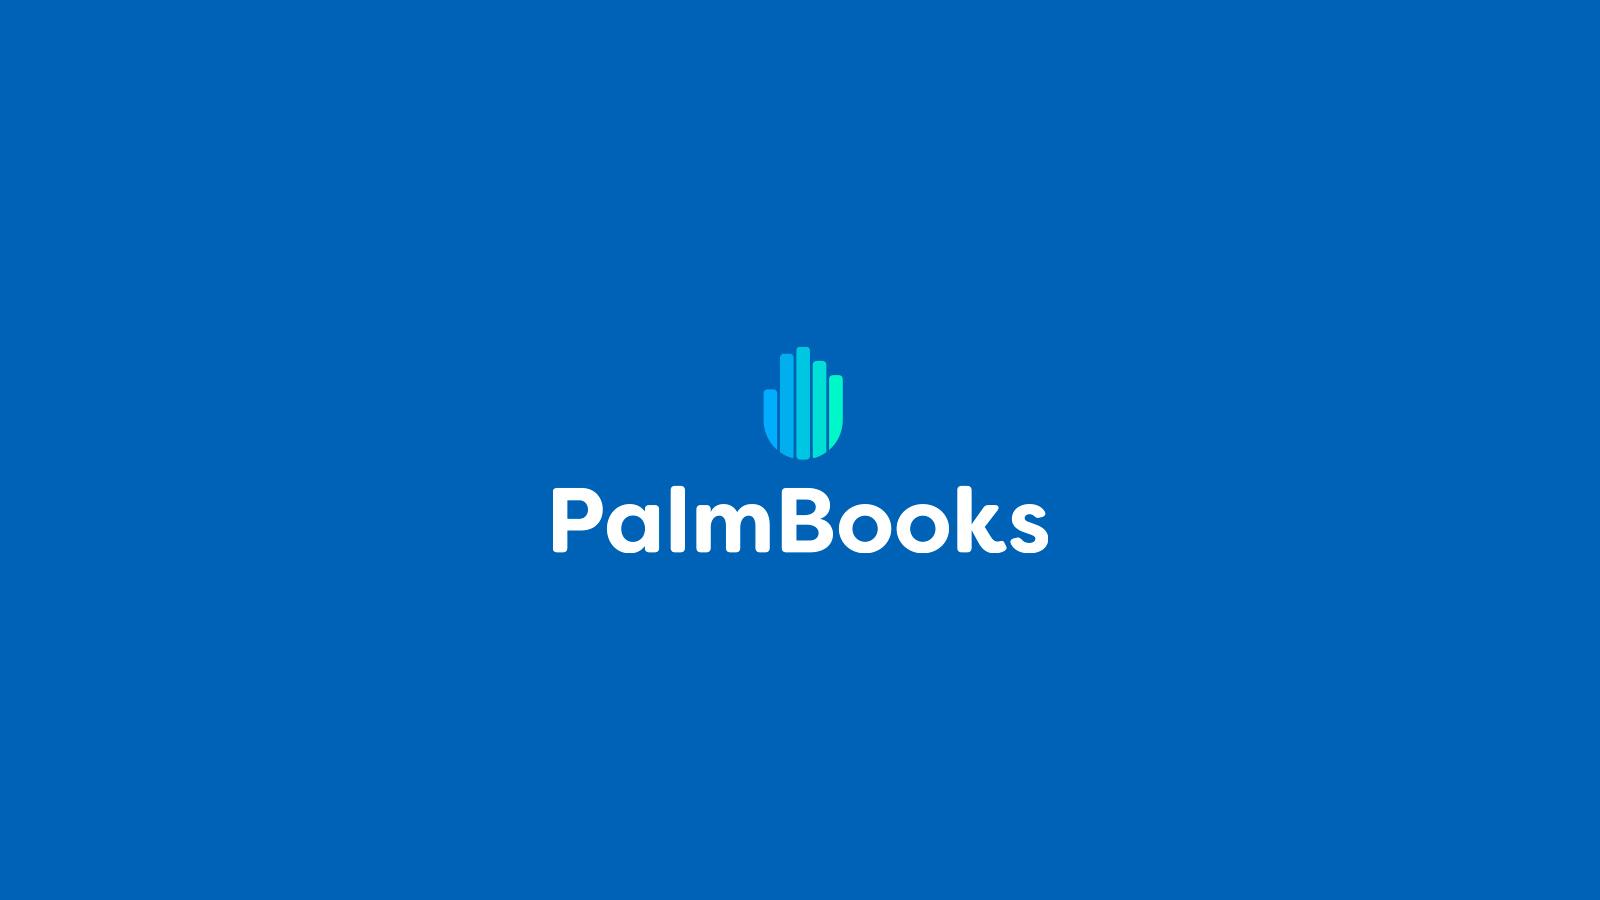 Palm Books 3.jpg